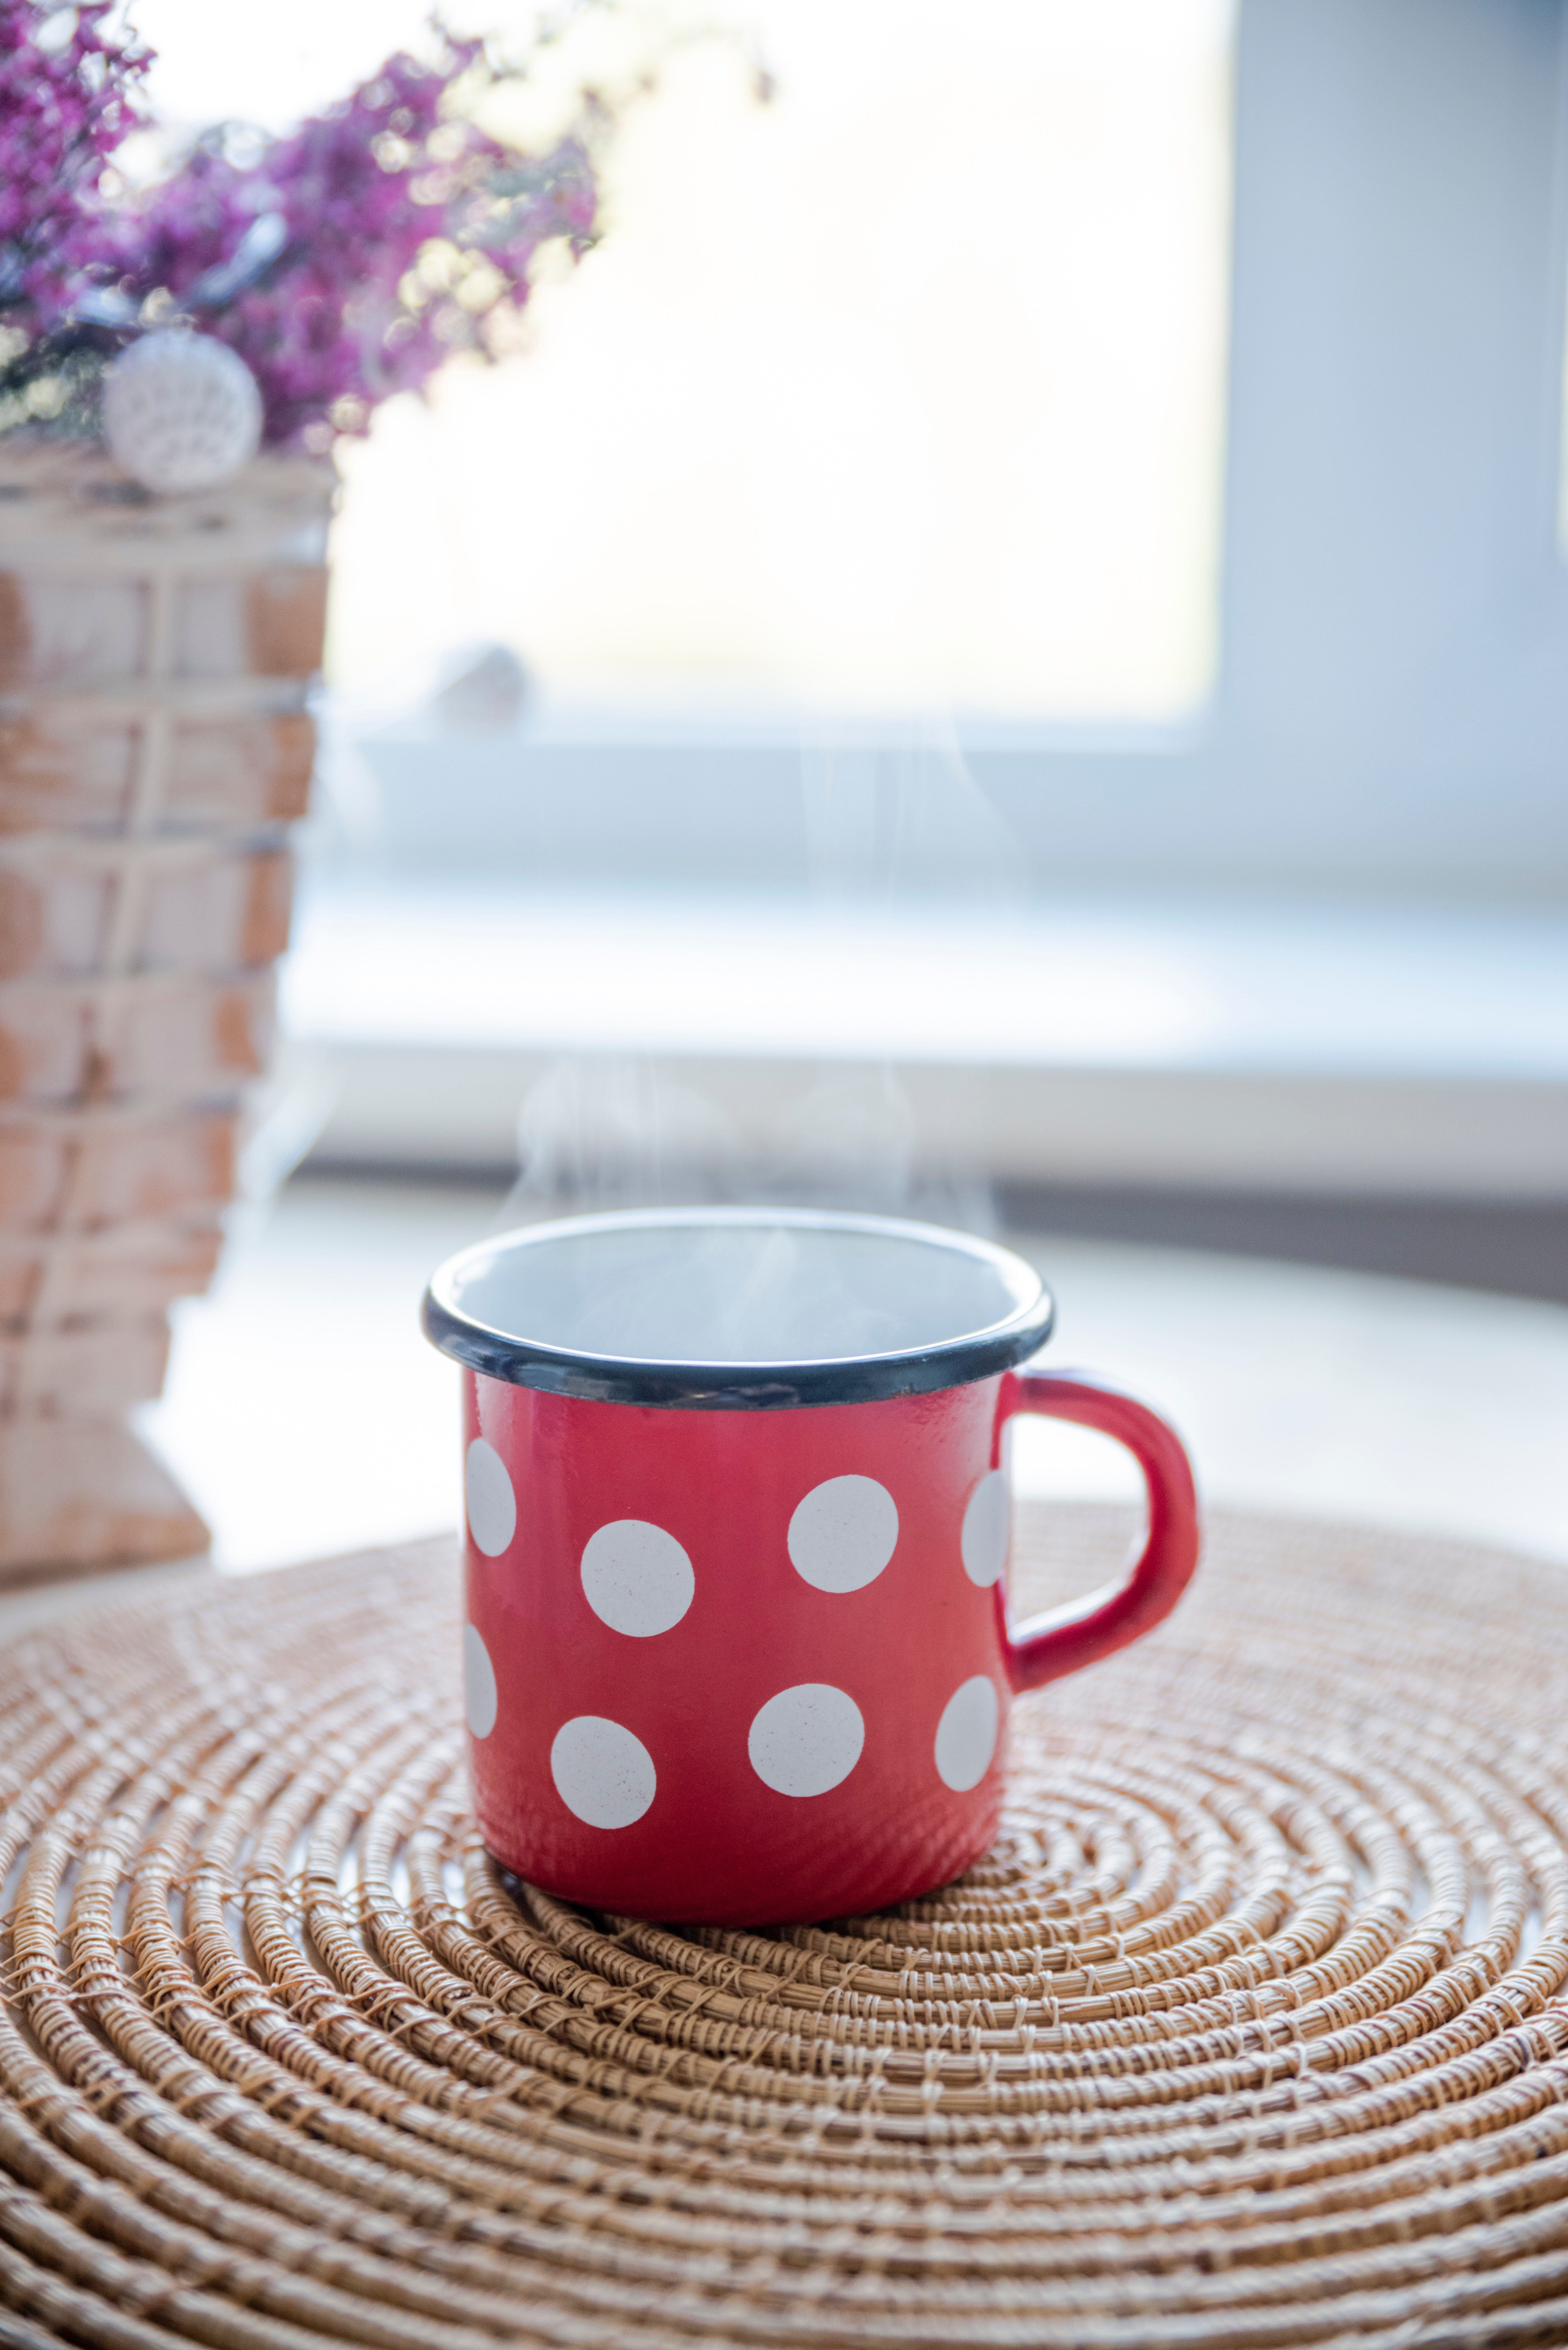 Red, white, and black ceramic mug on table photo